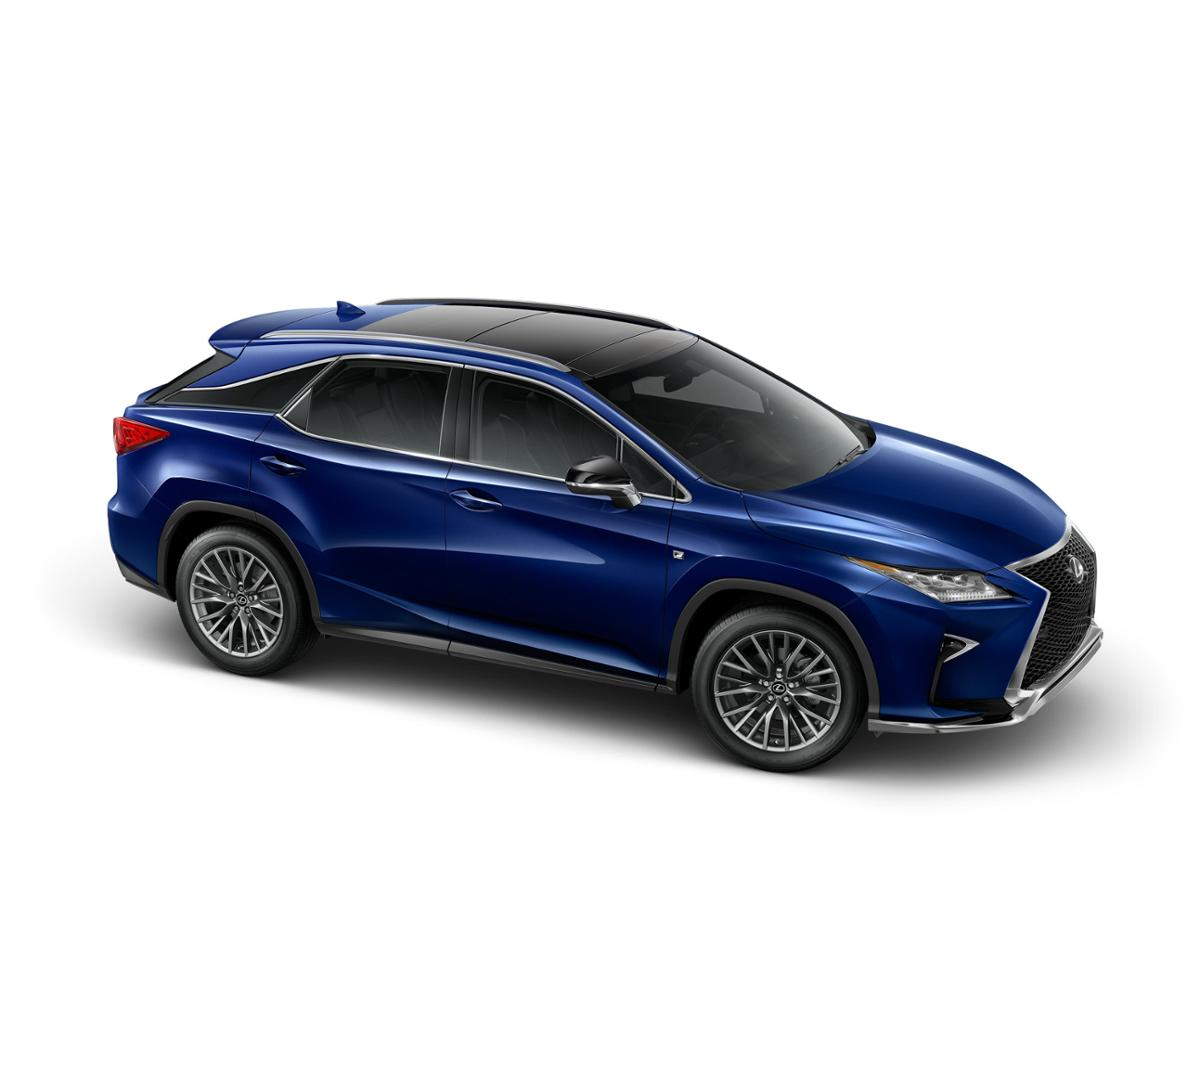 2017 Lexus Rx 350 Lexus Of Omaha R10566a